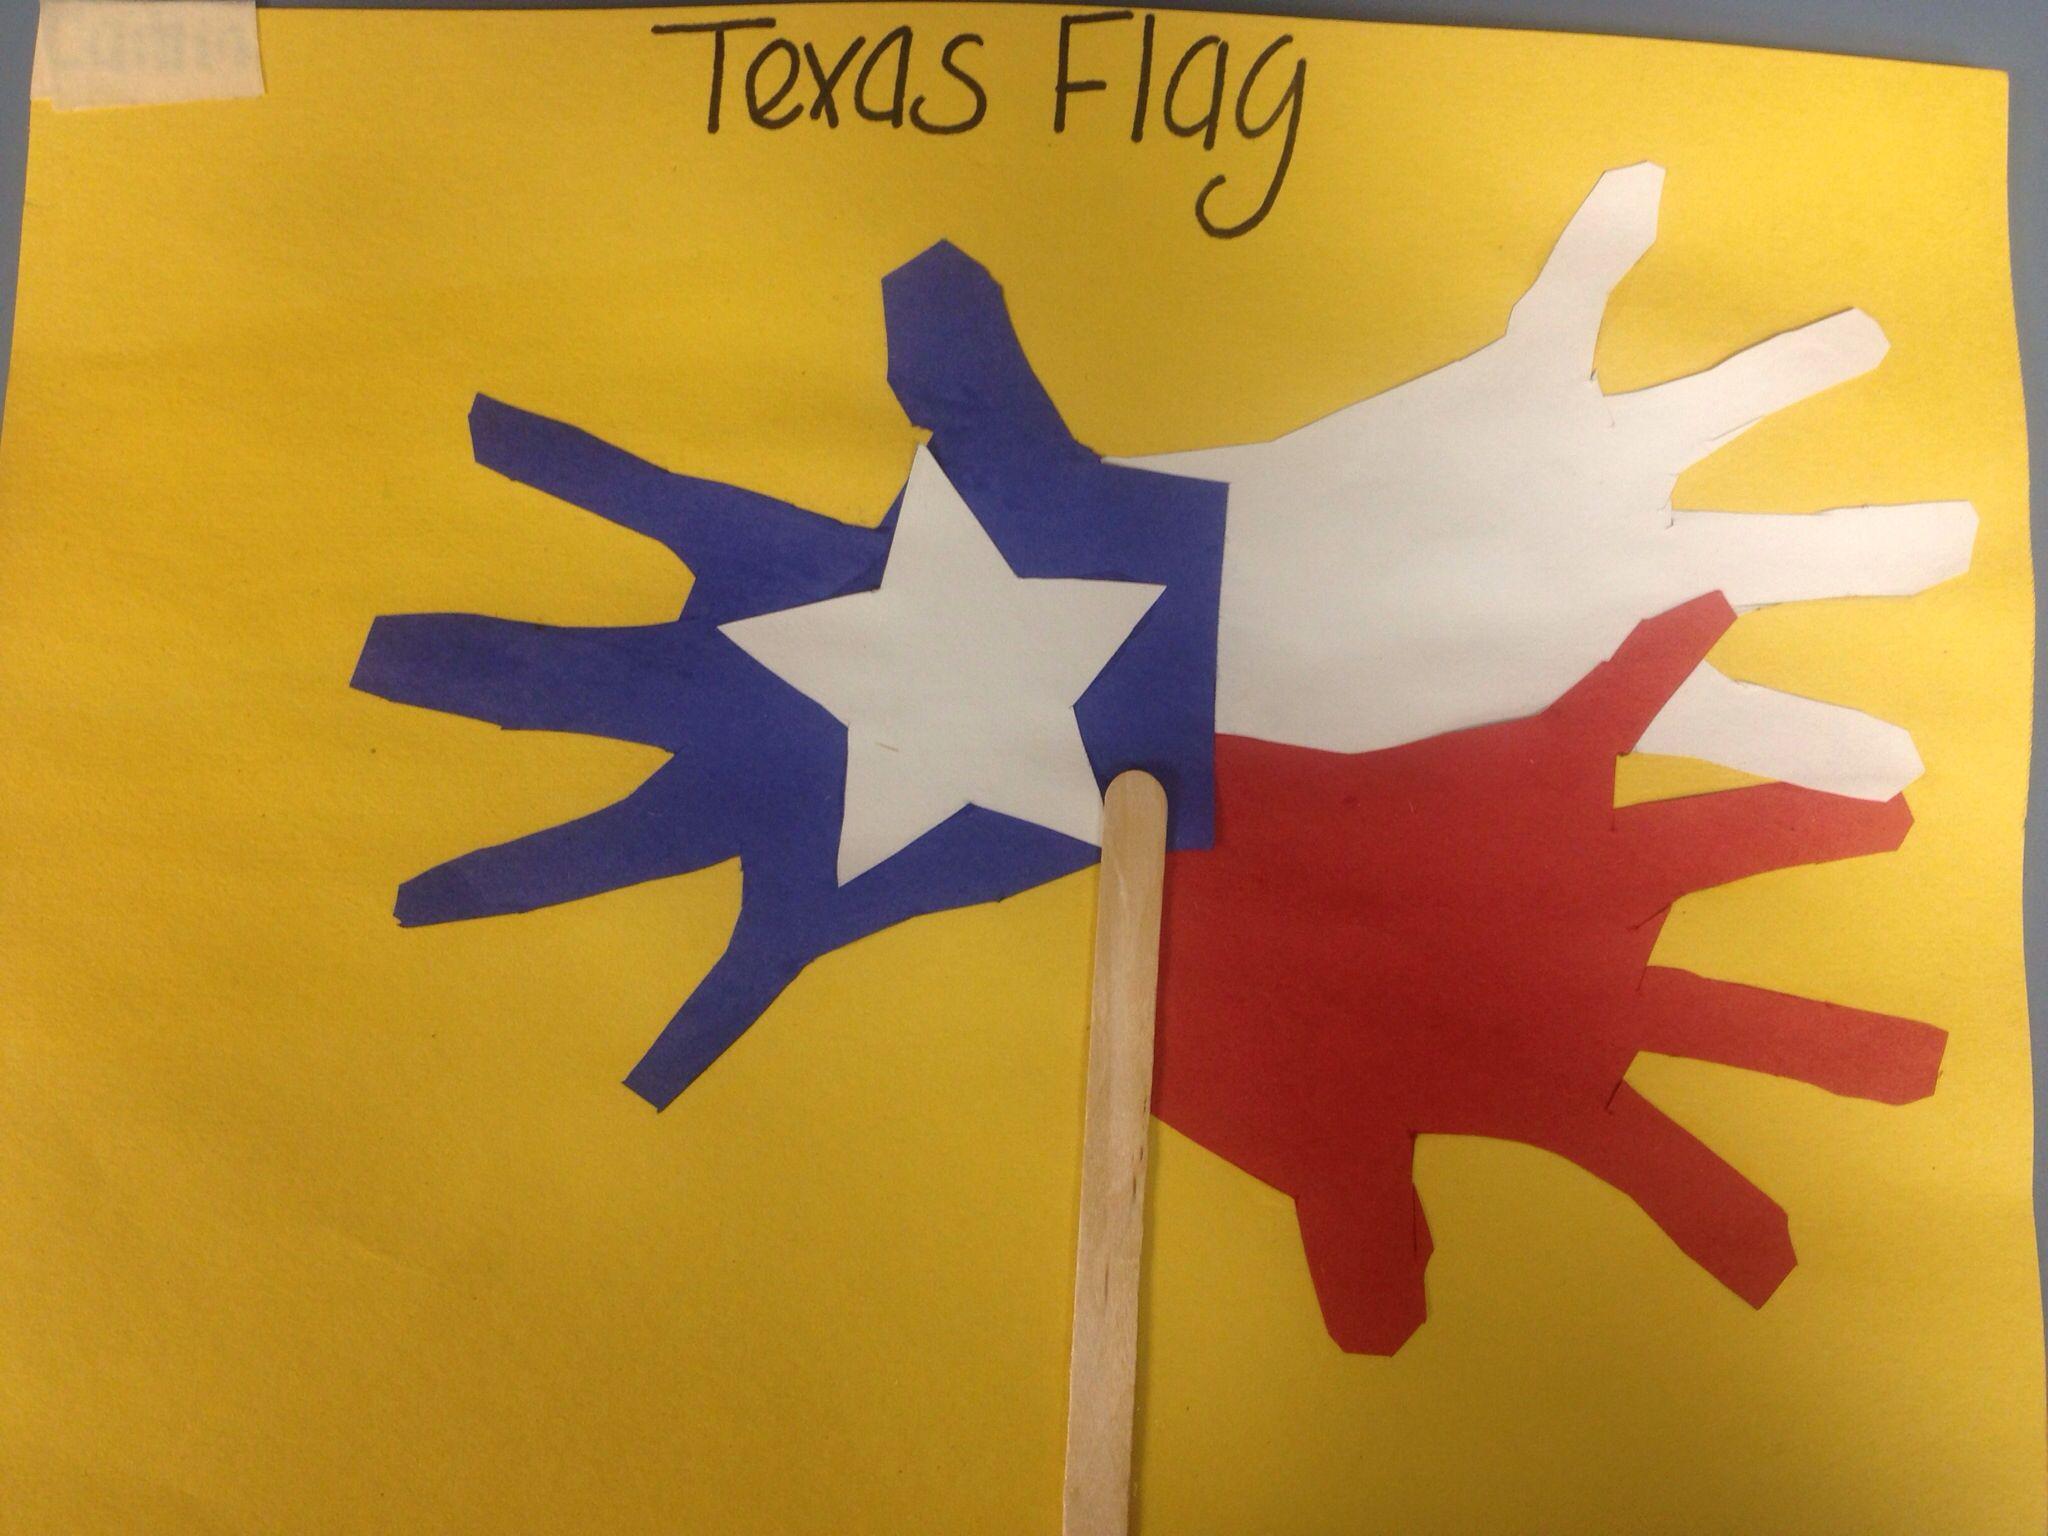 Texas Flag Diy